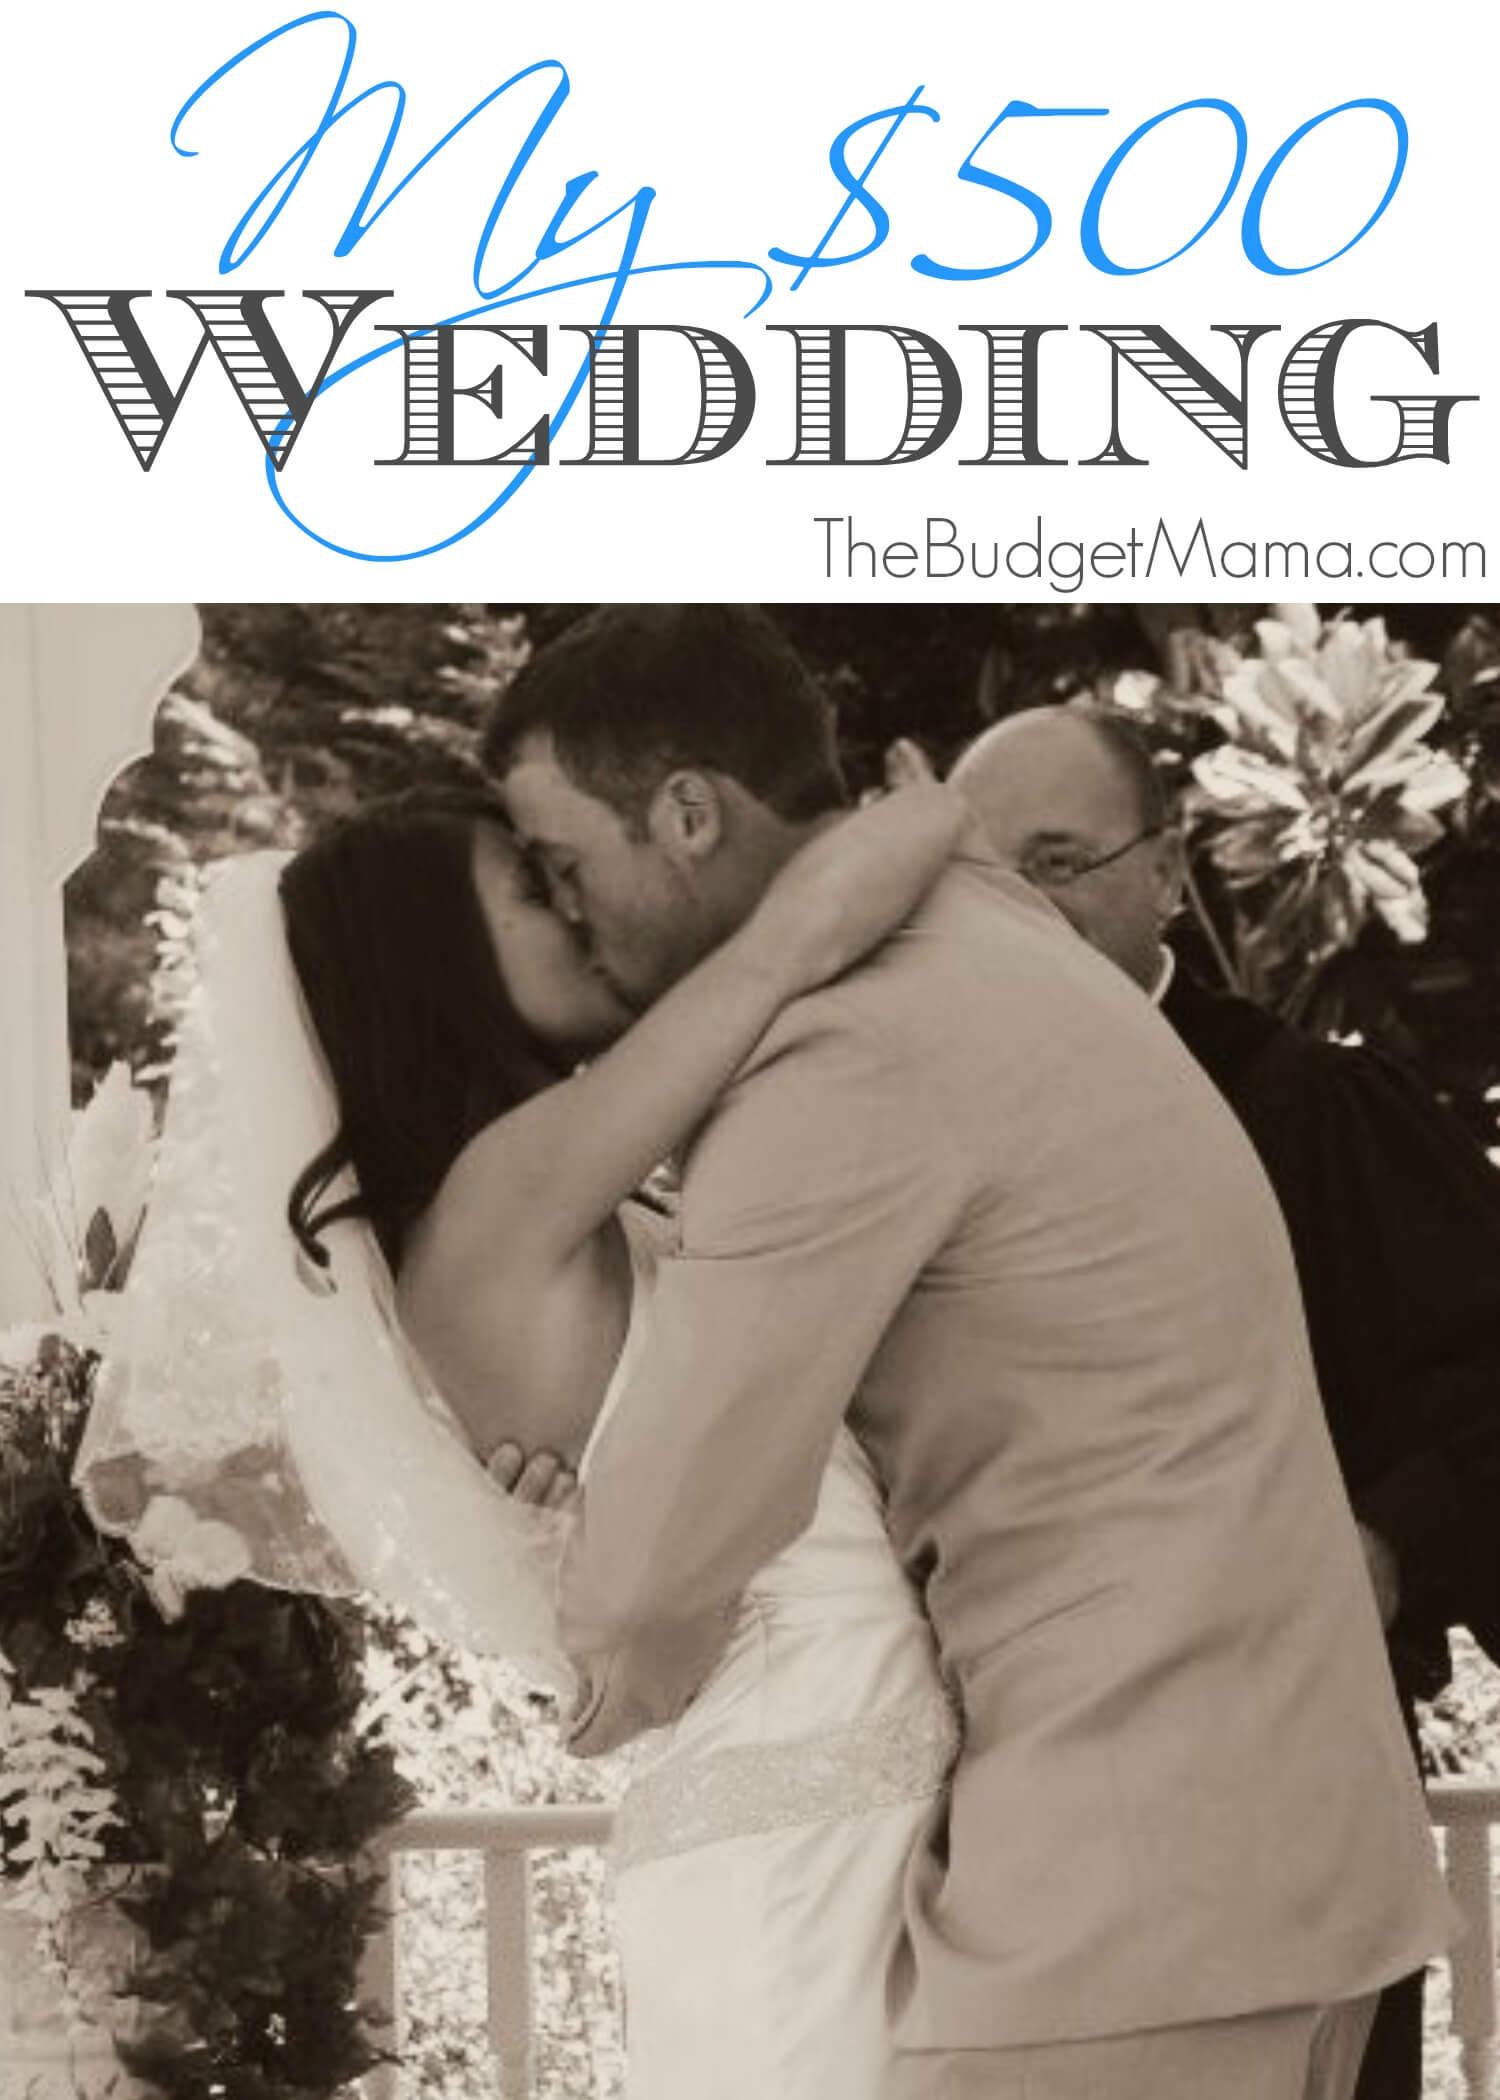 wedding ideas for under 500 dollars